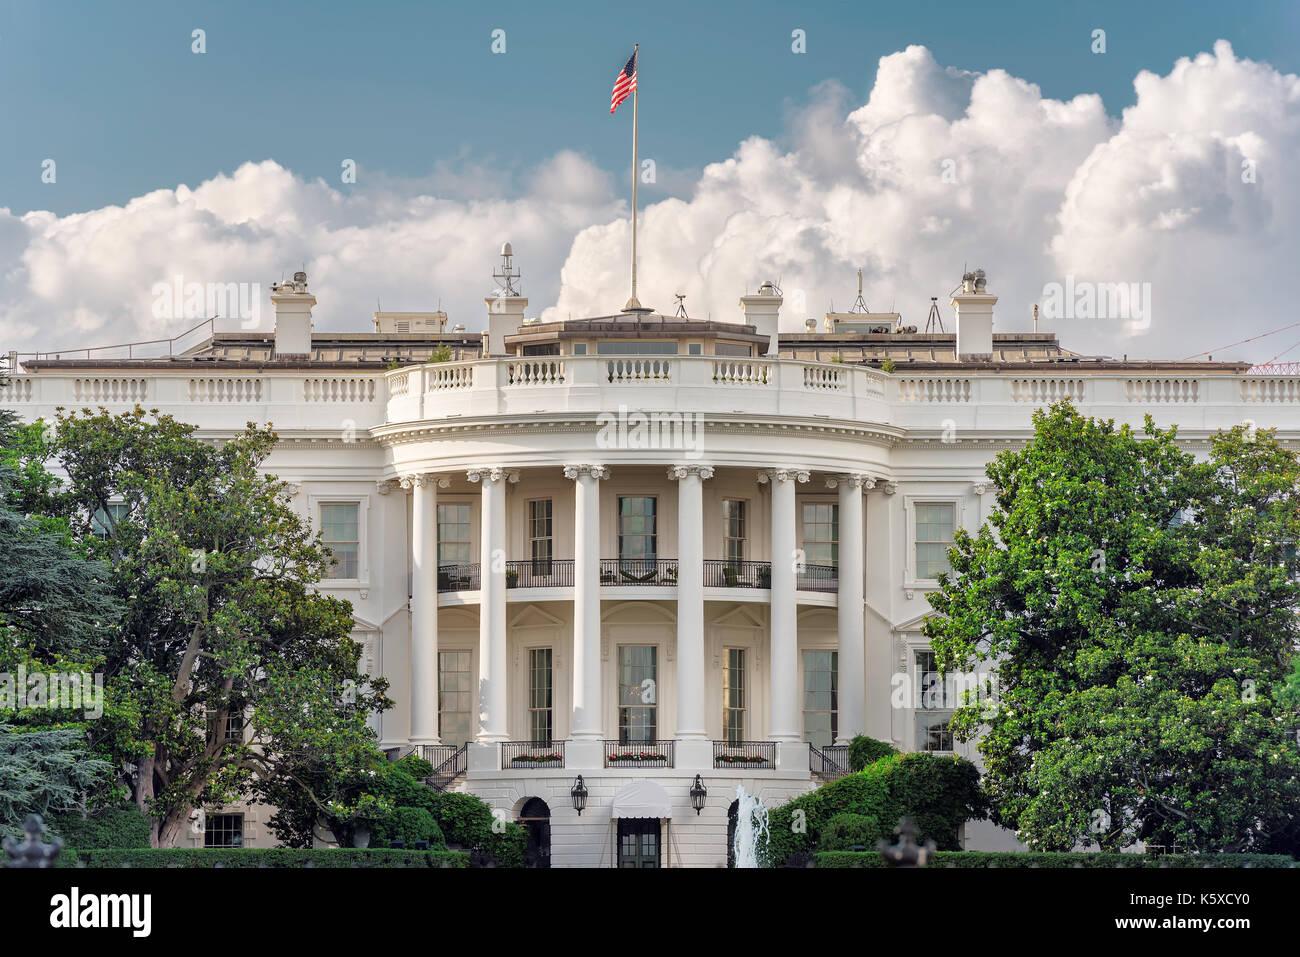 The White House in Washington DC, USA - Stock Image